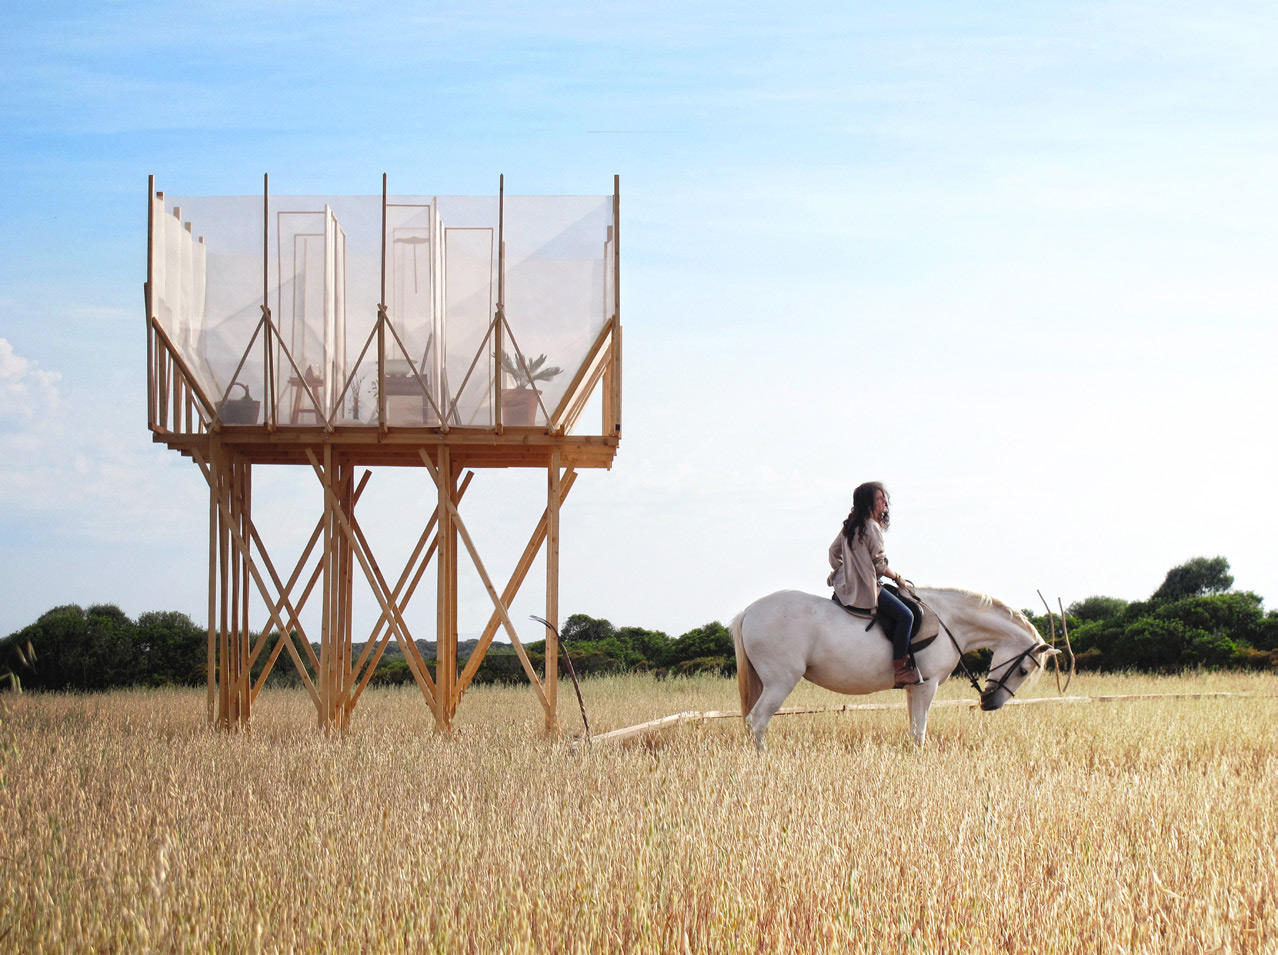 Gartnerfuglen Architects & Mariana De Delás, Photography by Gartnerfuglen Architects & Mariana De Delás, fromThe New Nomads,Copyright Gestalten 2015